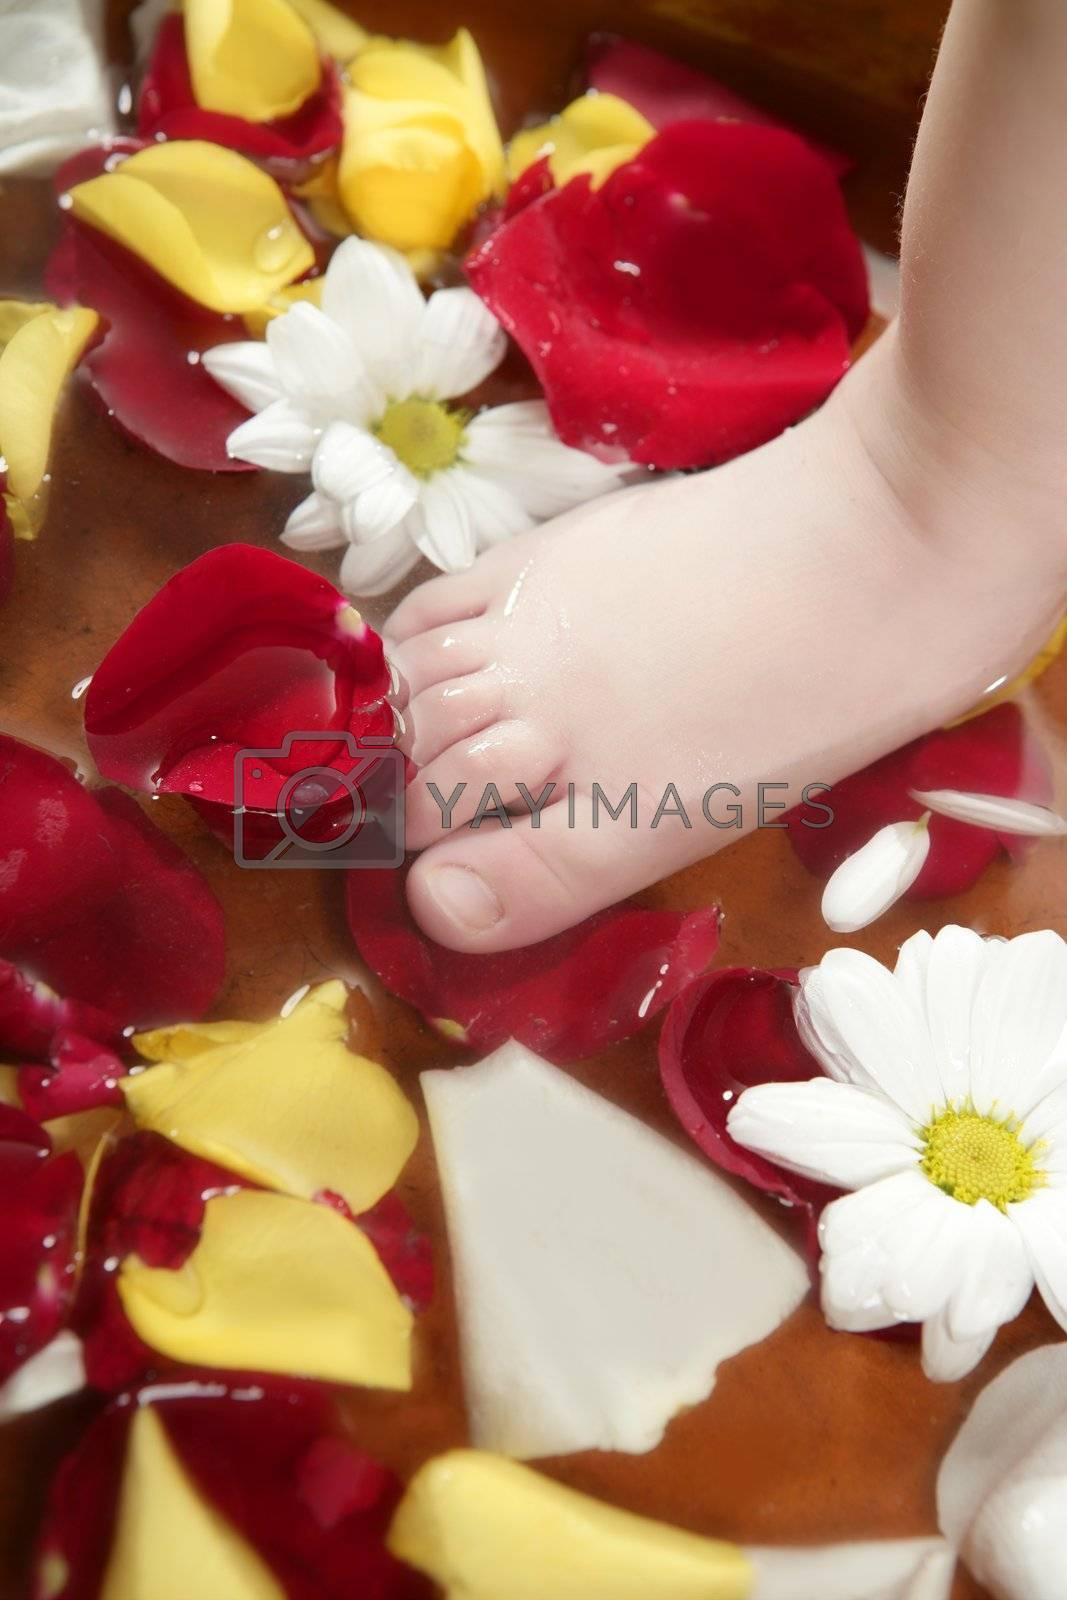 Aromatherapy, flowers children feet bath, colorful rose petal